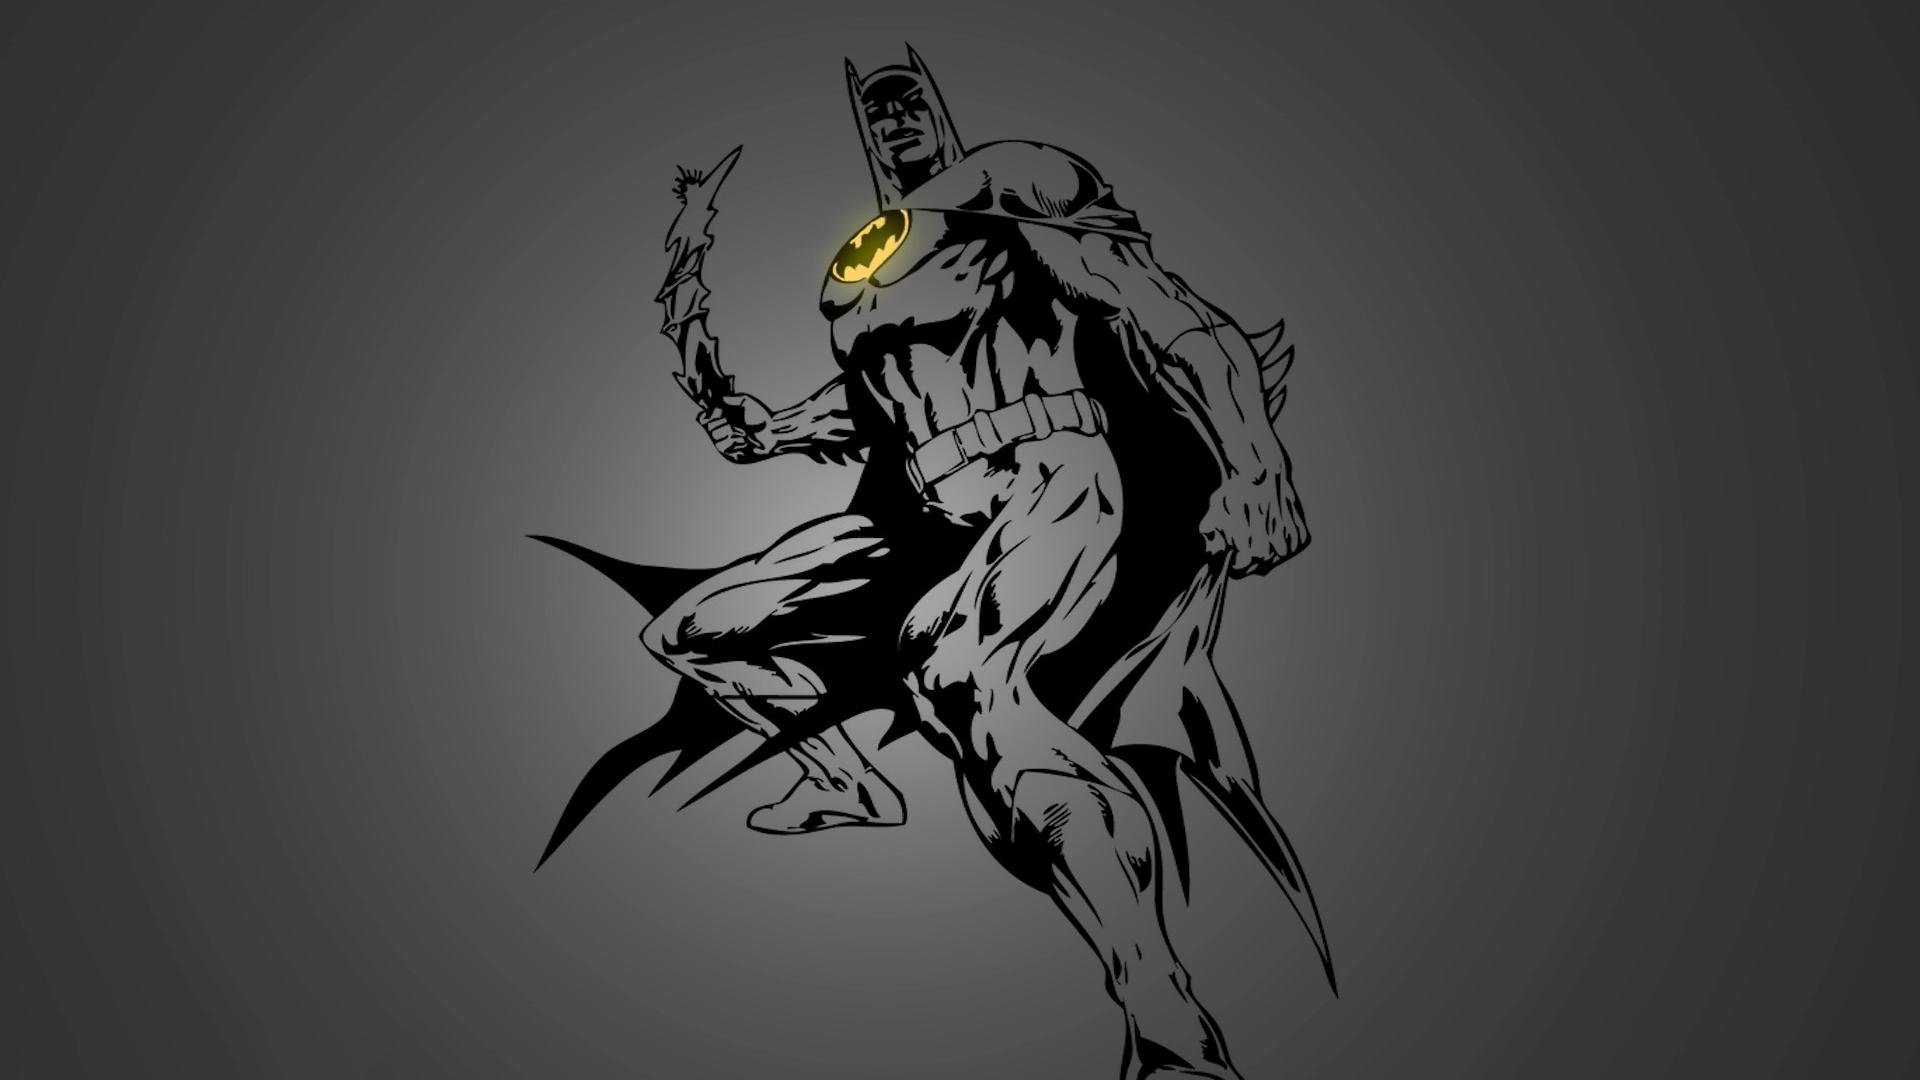 batman wallpapers download 059